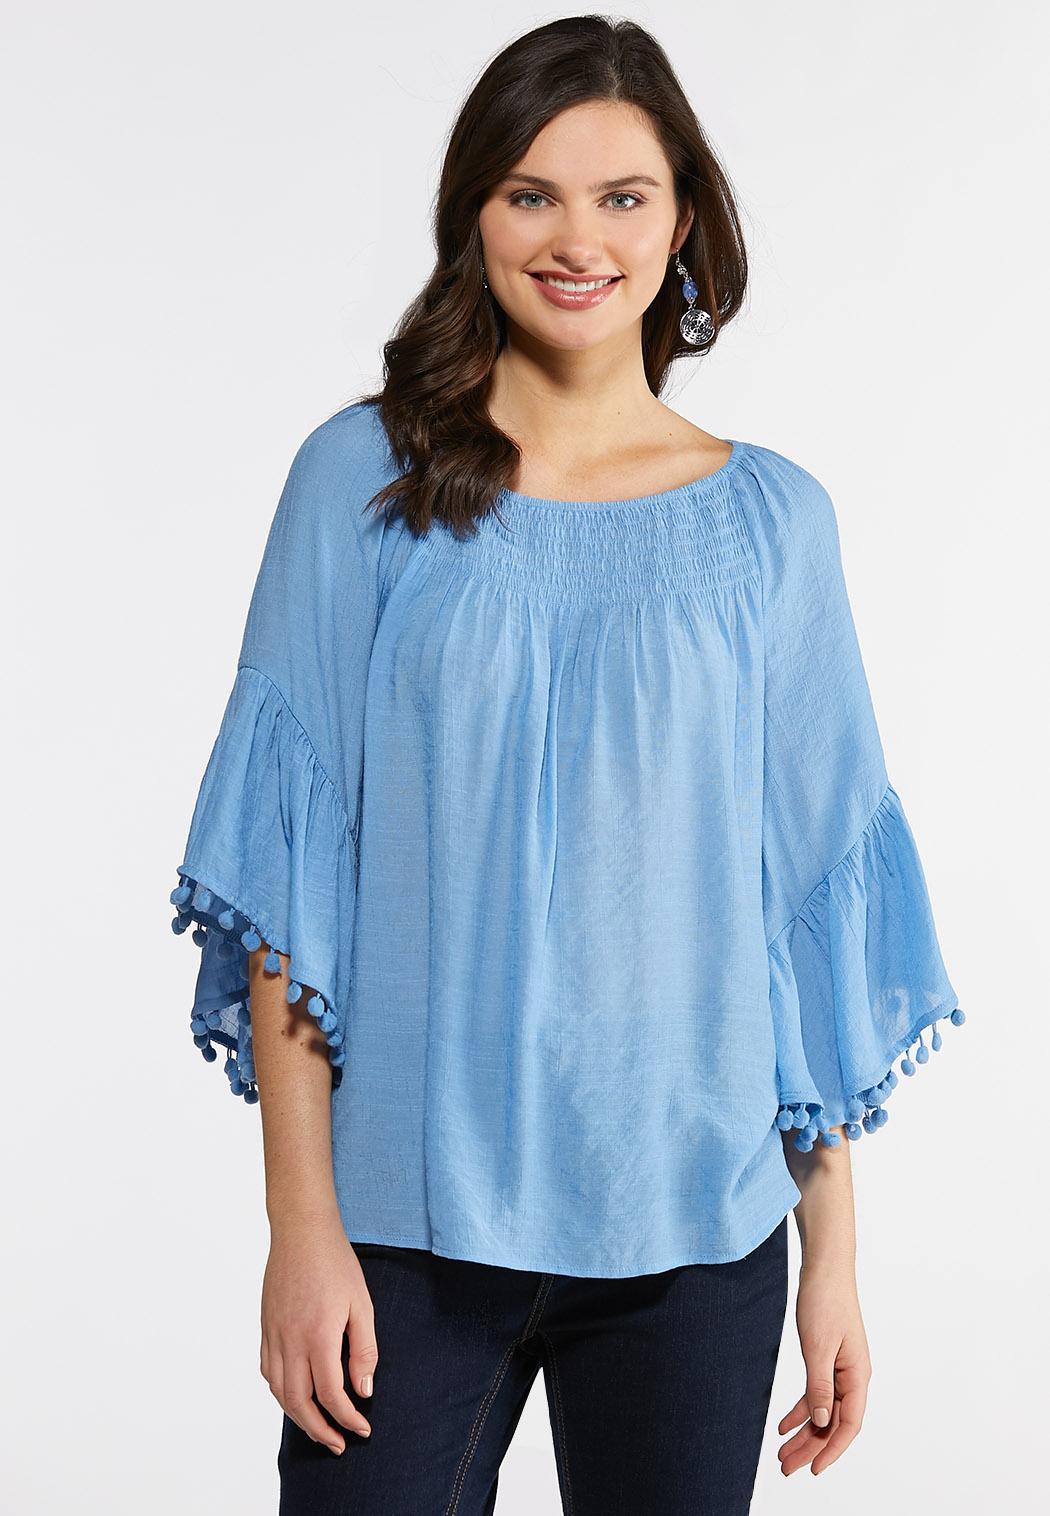 ec0c6a26375 Women s Shirts   Blouses